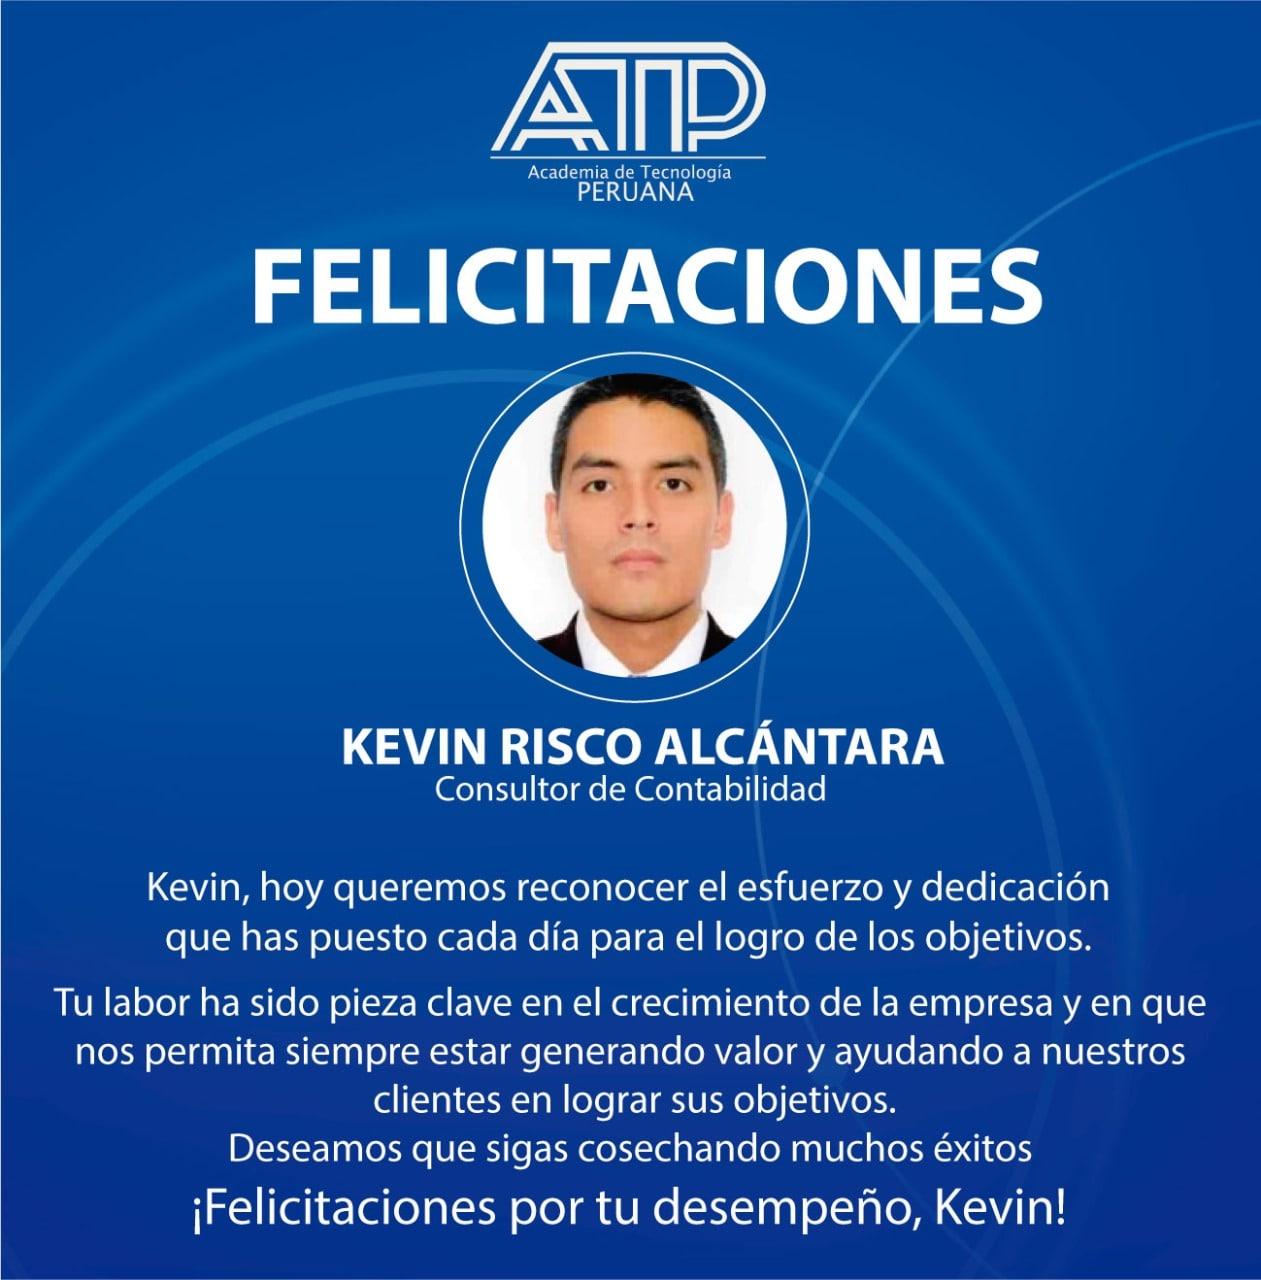 ¡Gracias kevin Risco por ser parte de la familia ATP!